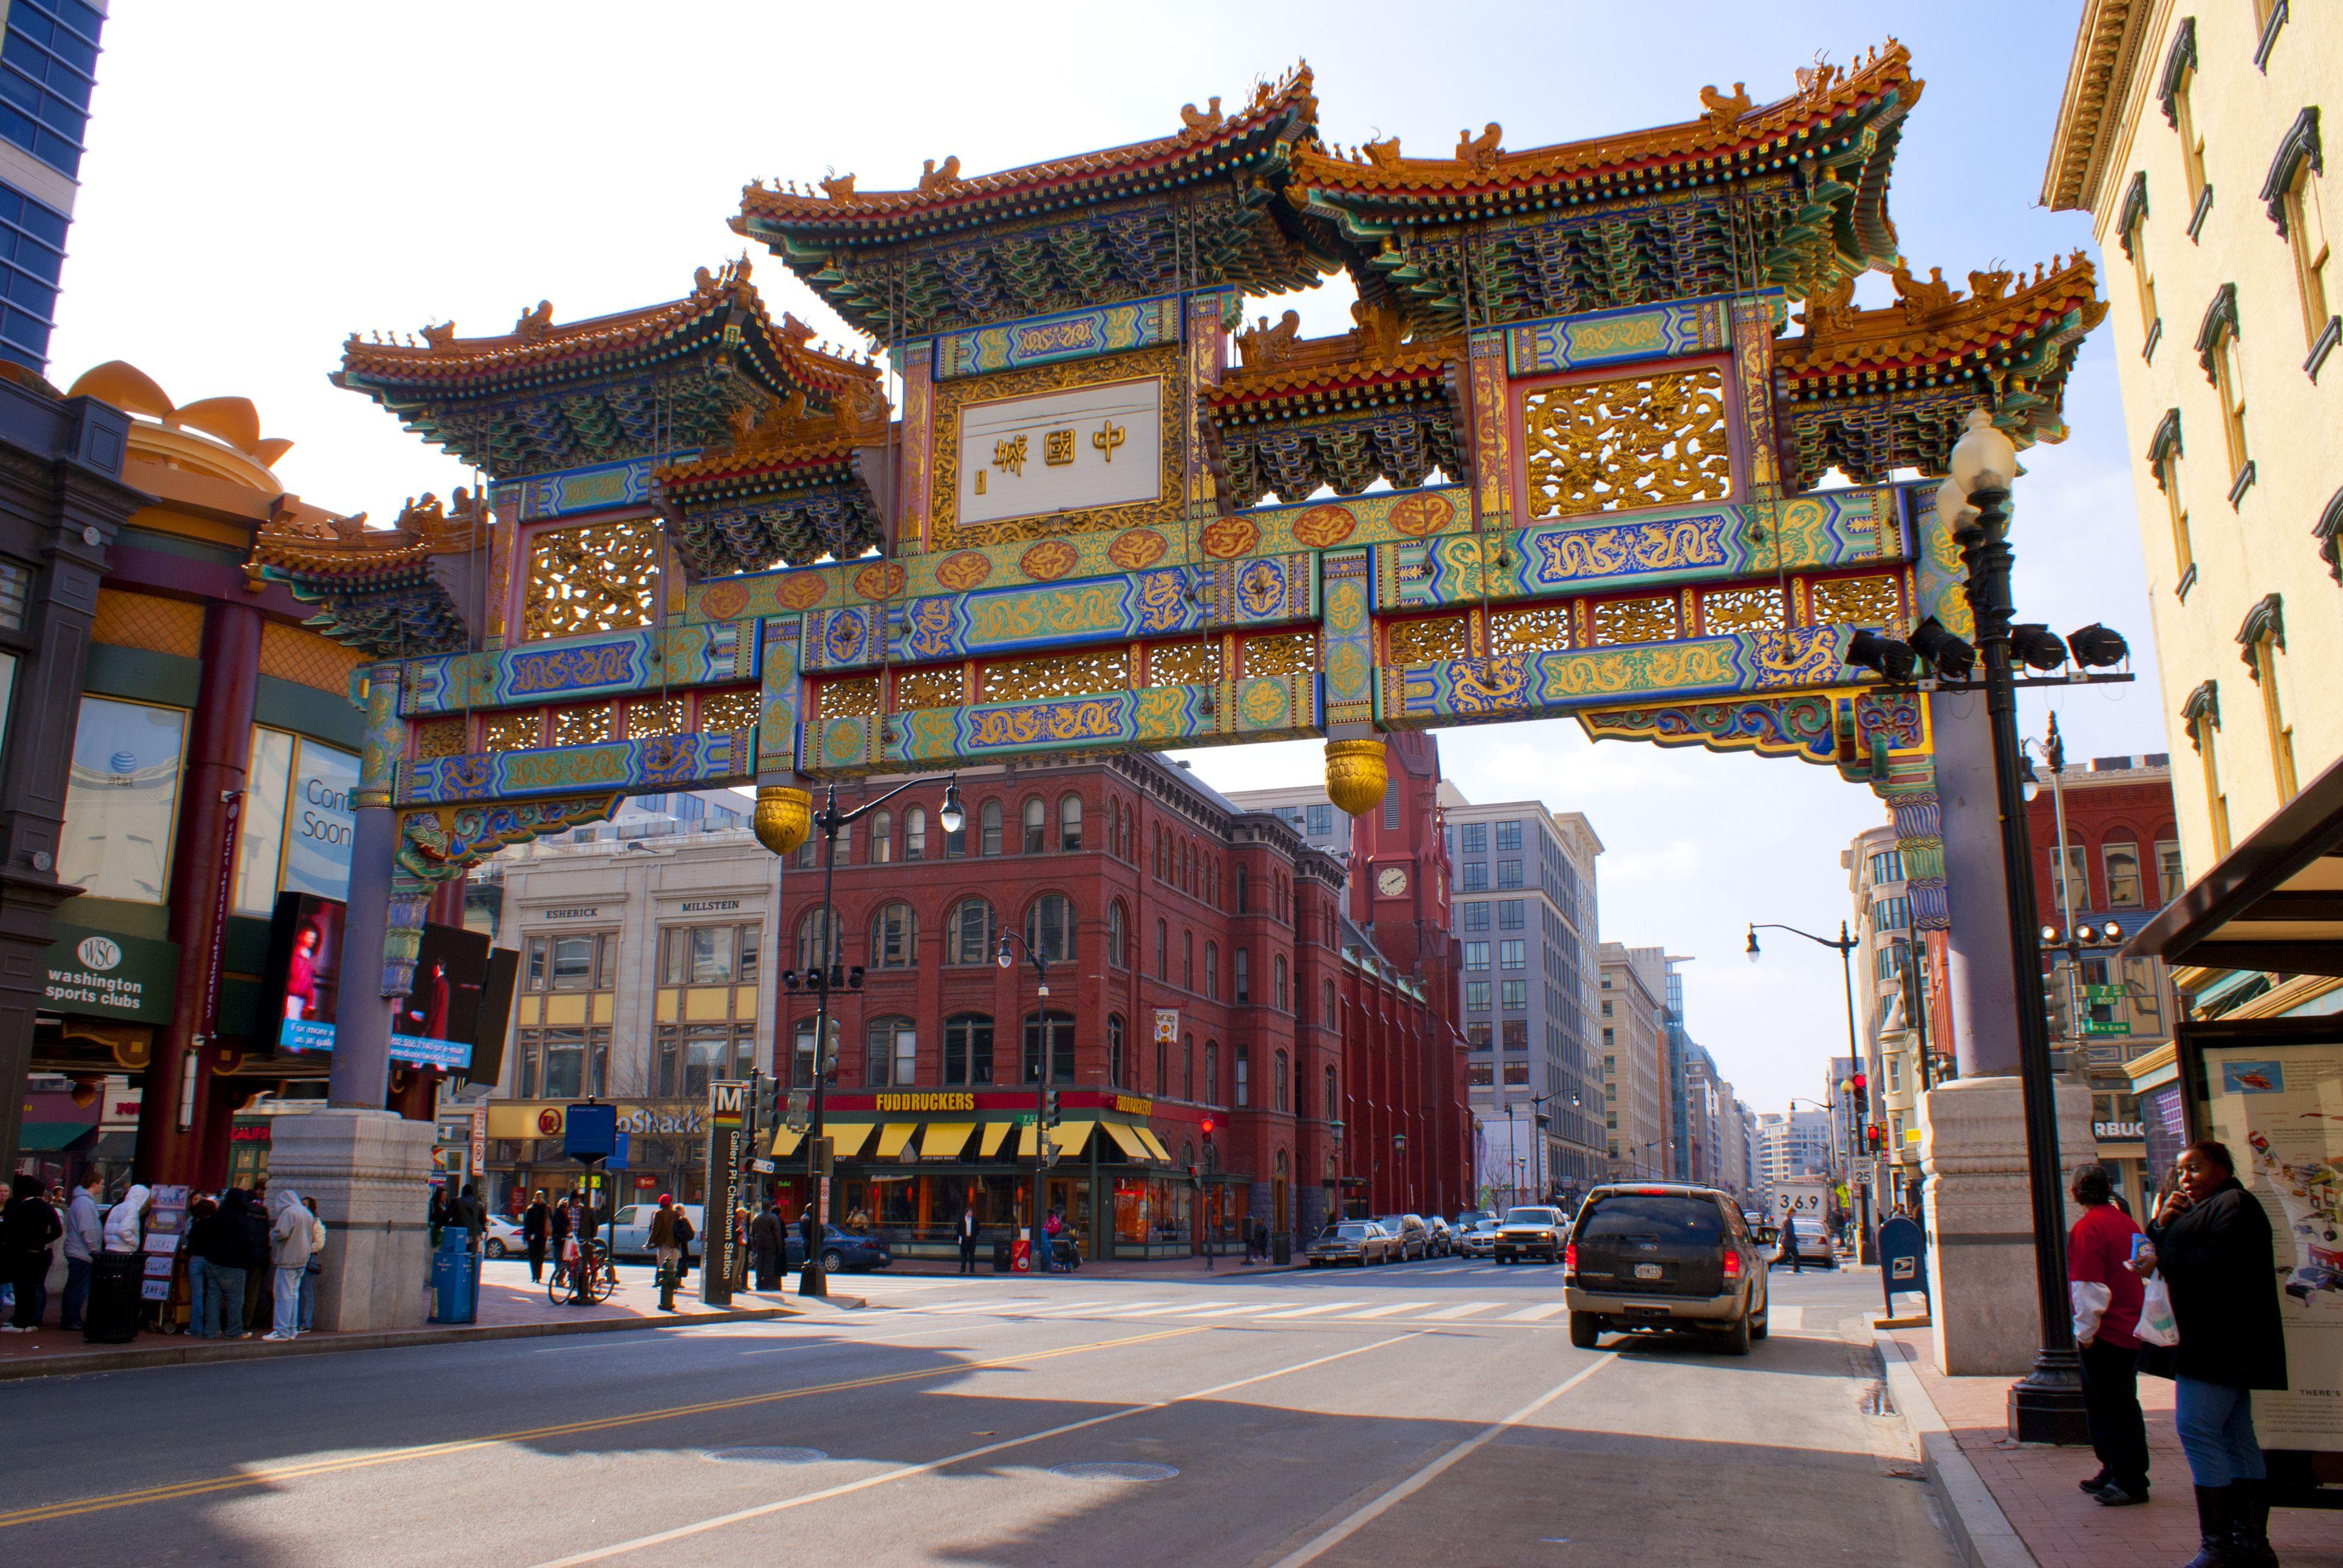 China Town, Washington, DC.